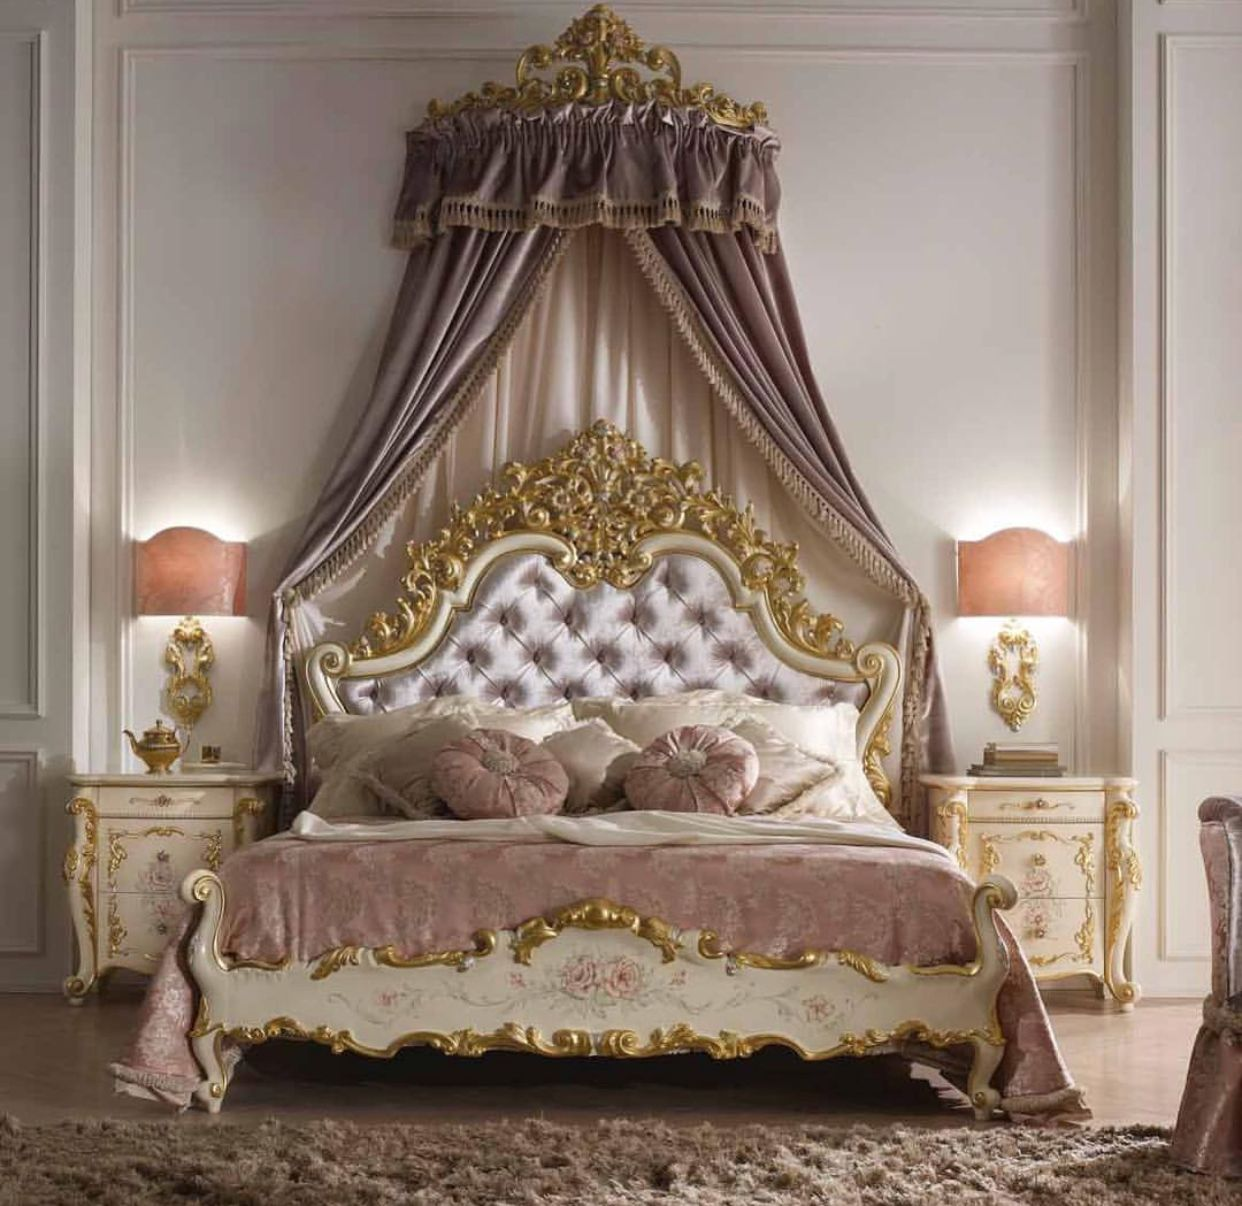 old hollywood bedroom furniture. old hollywood bedroom furniture e